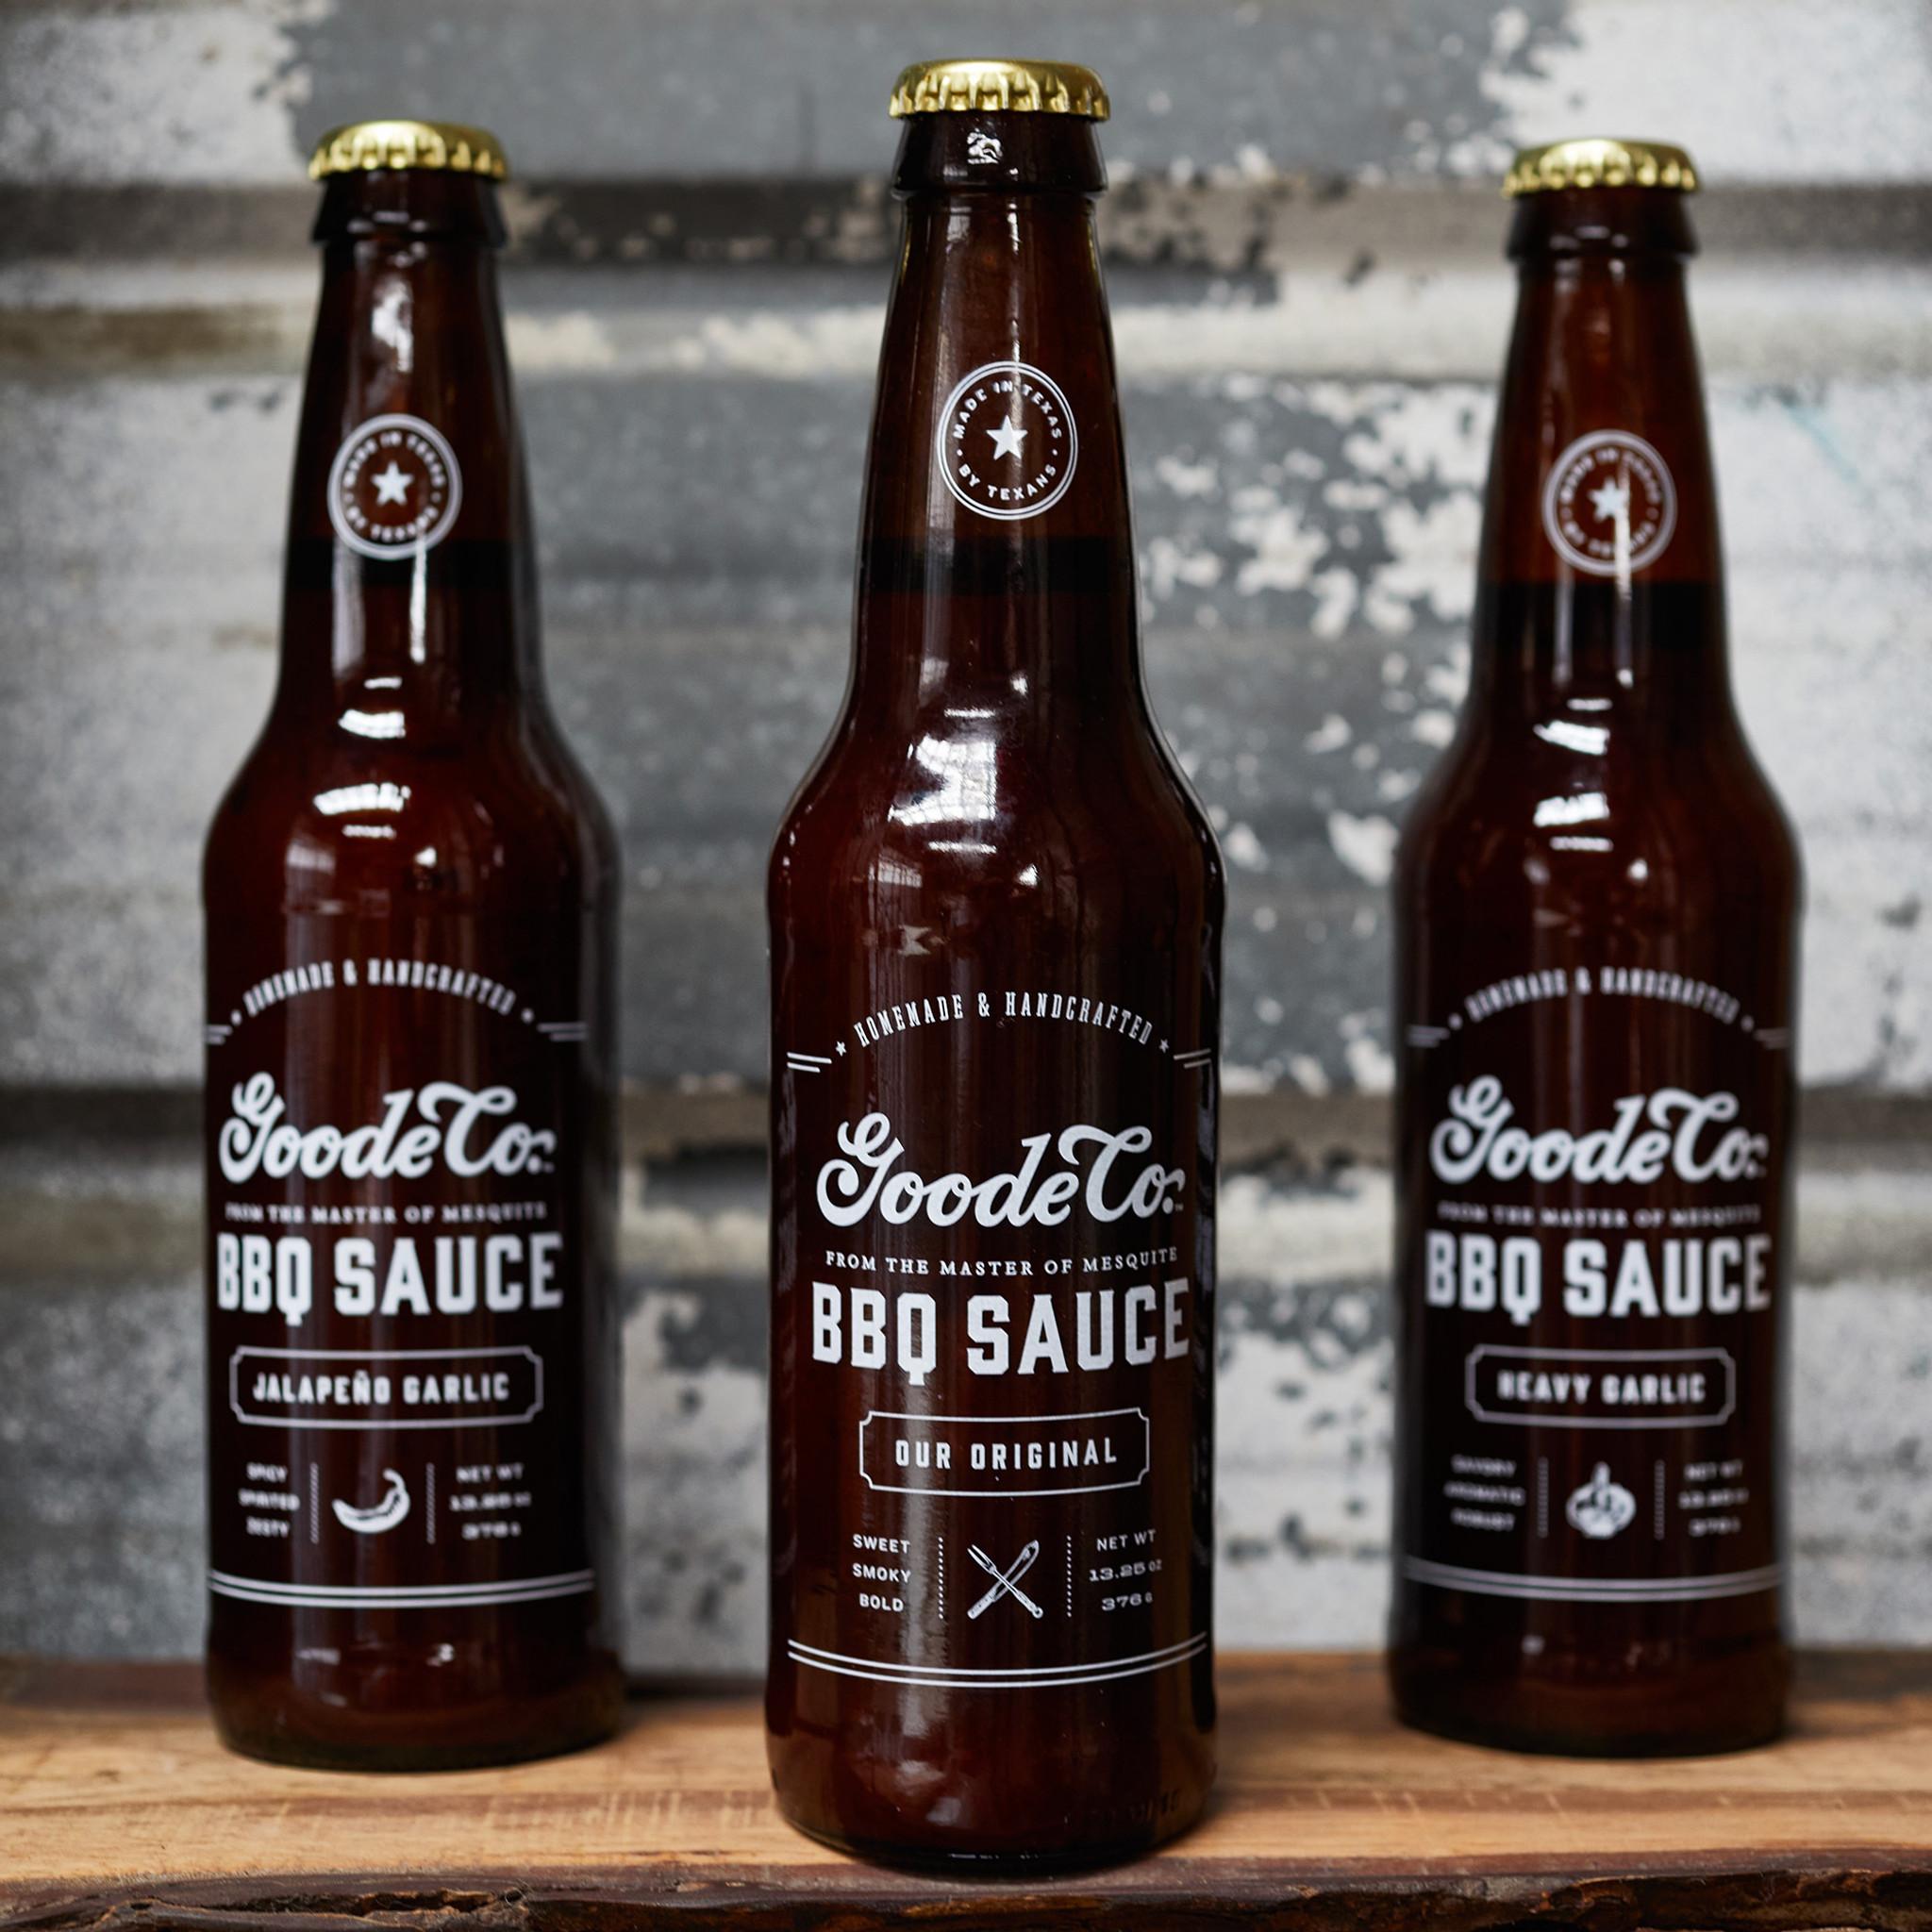 3 bottle set of Goode Co's 13.5-ounce longneck beer bottle of Original, Jalapeño, and Heavy Garlic BBQ sauces.